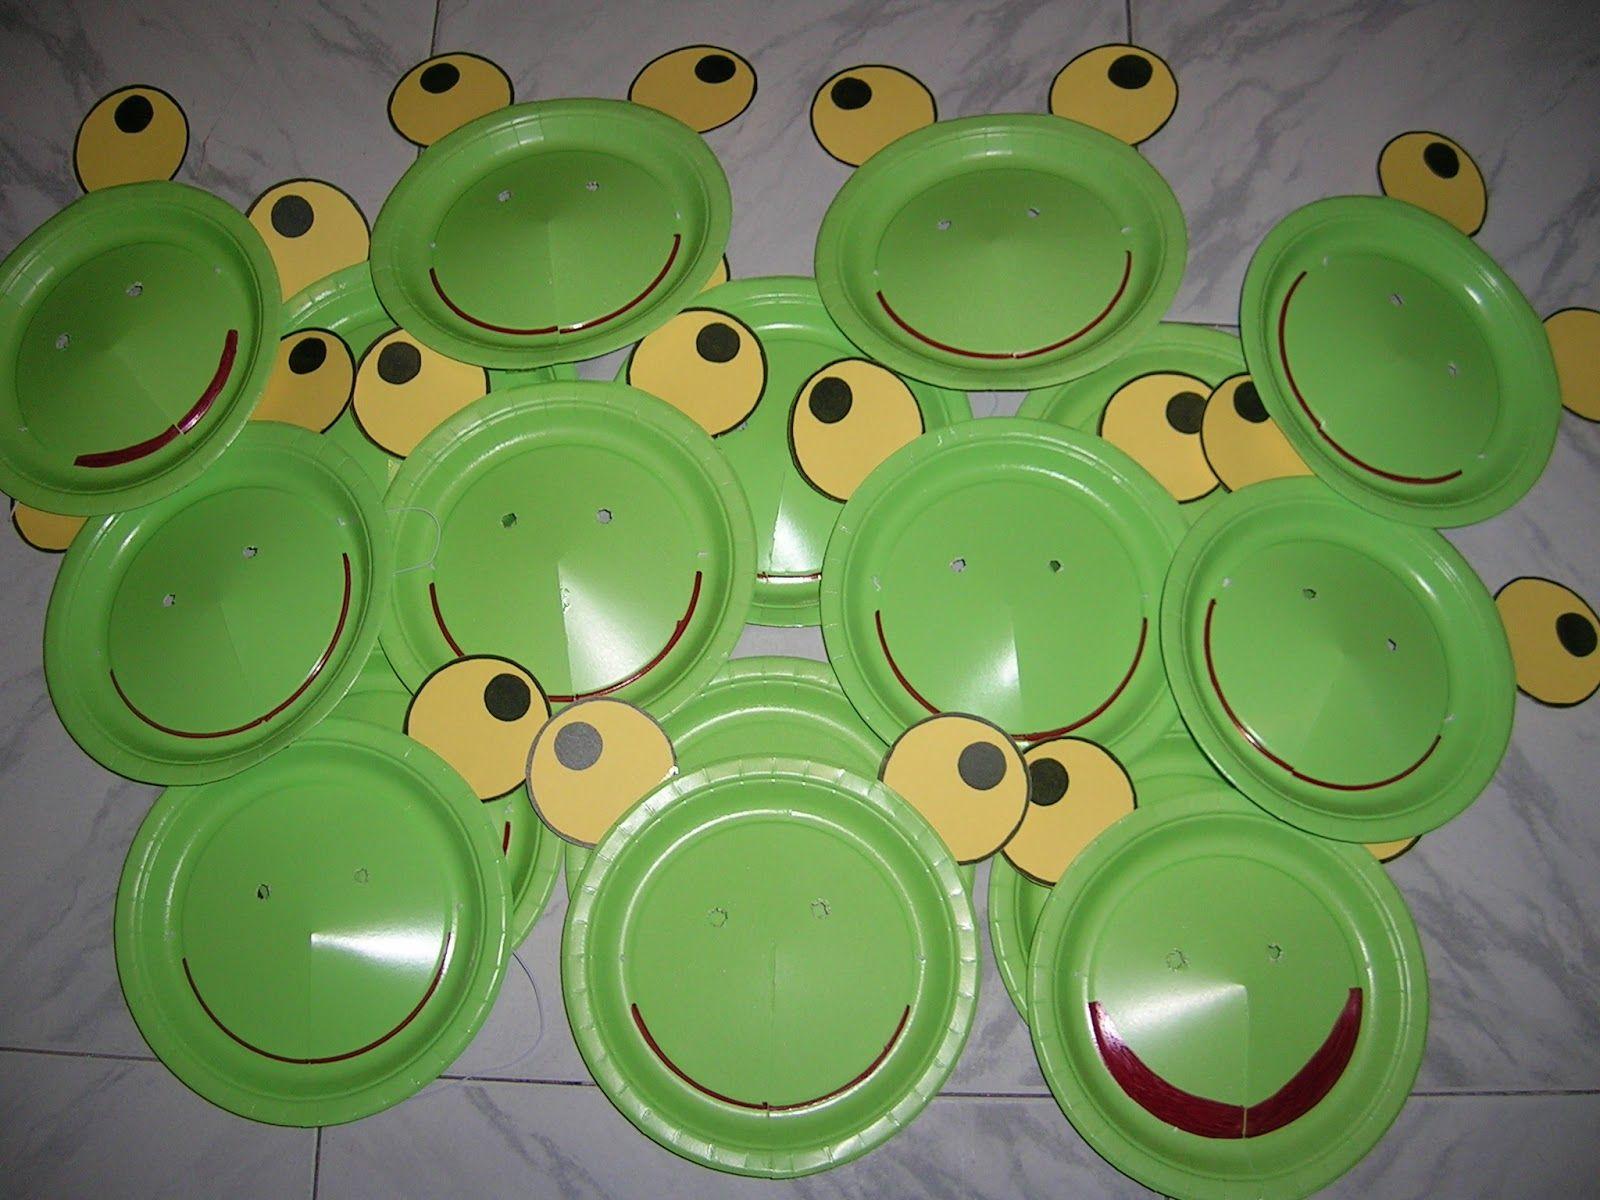 platos decorados para cumpleaos de sapo pepe